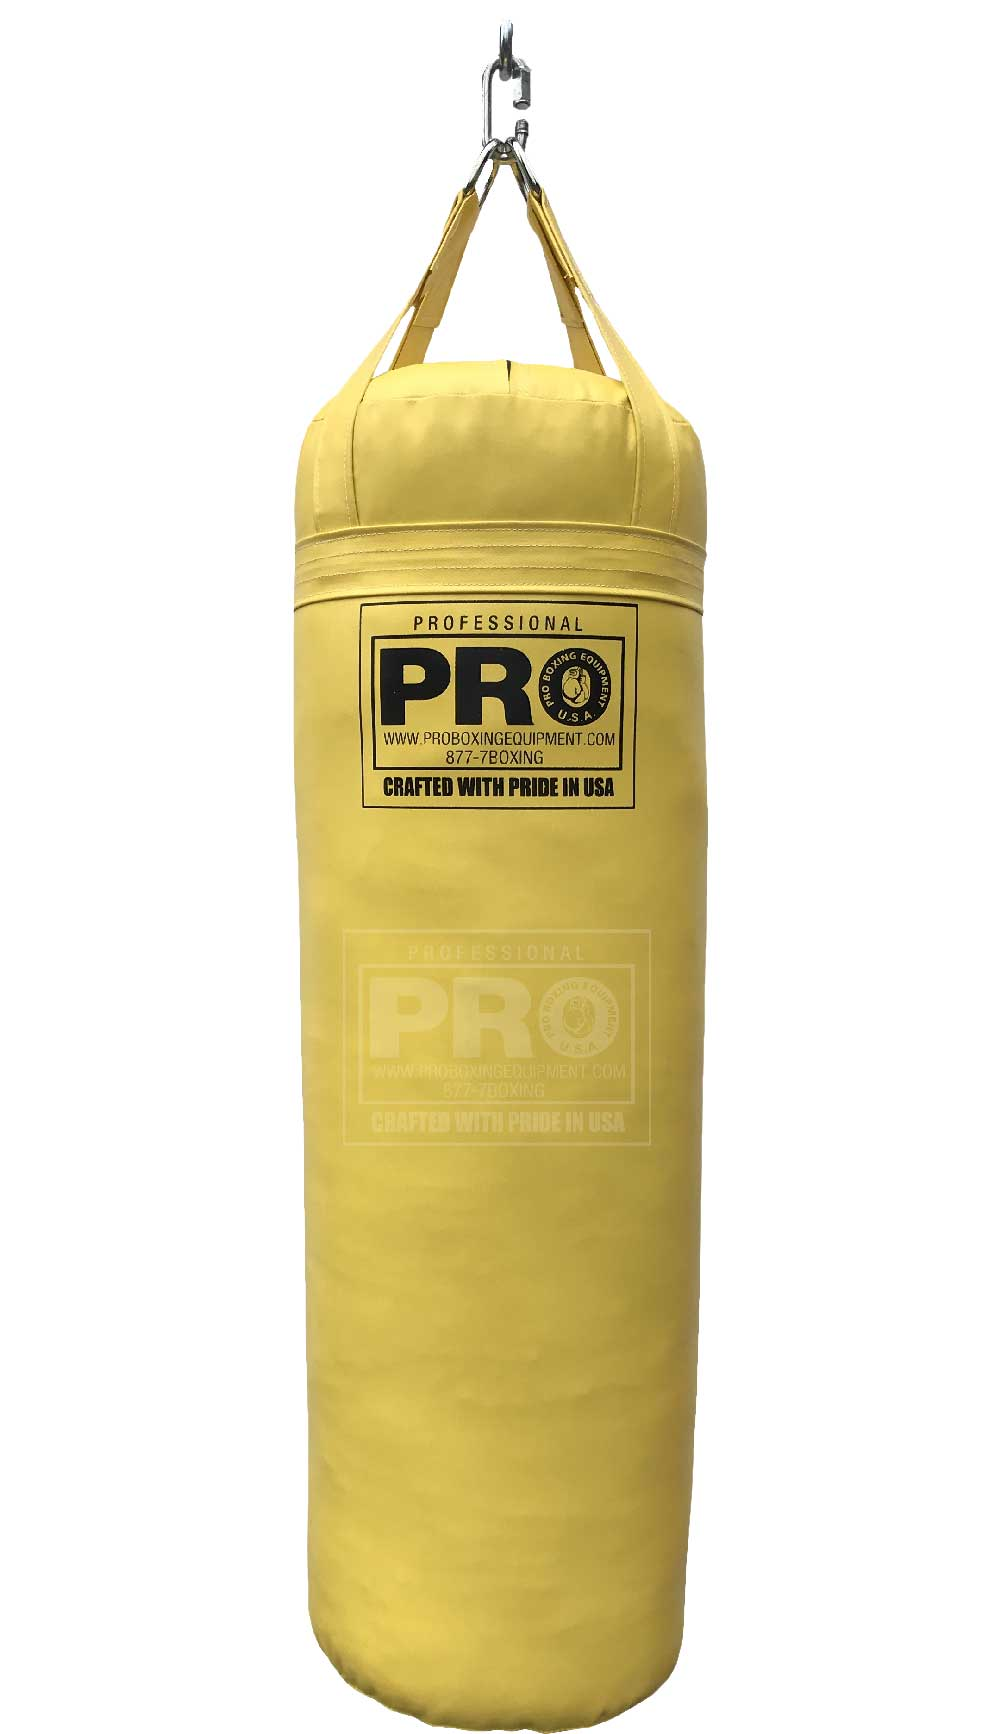 80 lb punching bag free shipping made in usa heavy bag